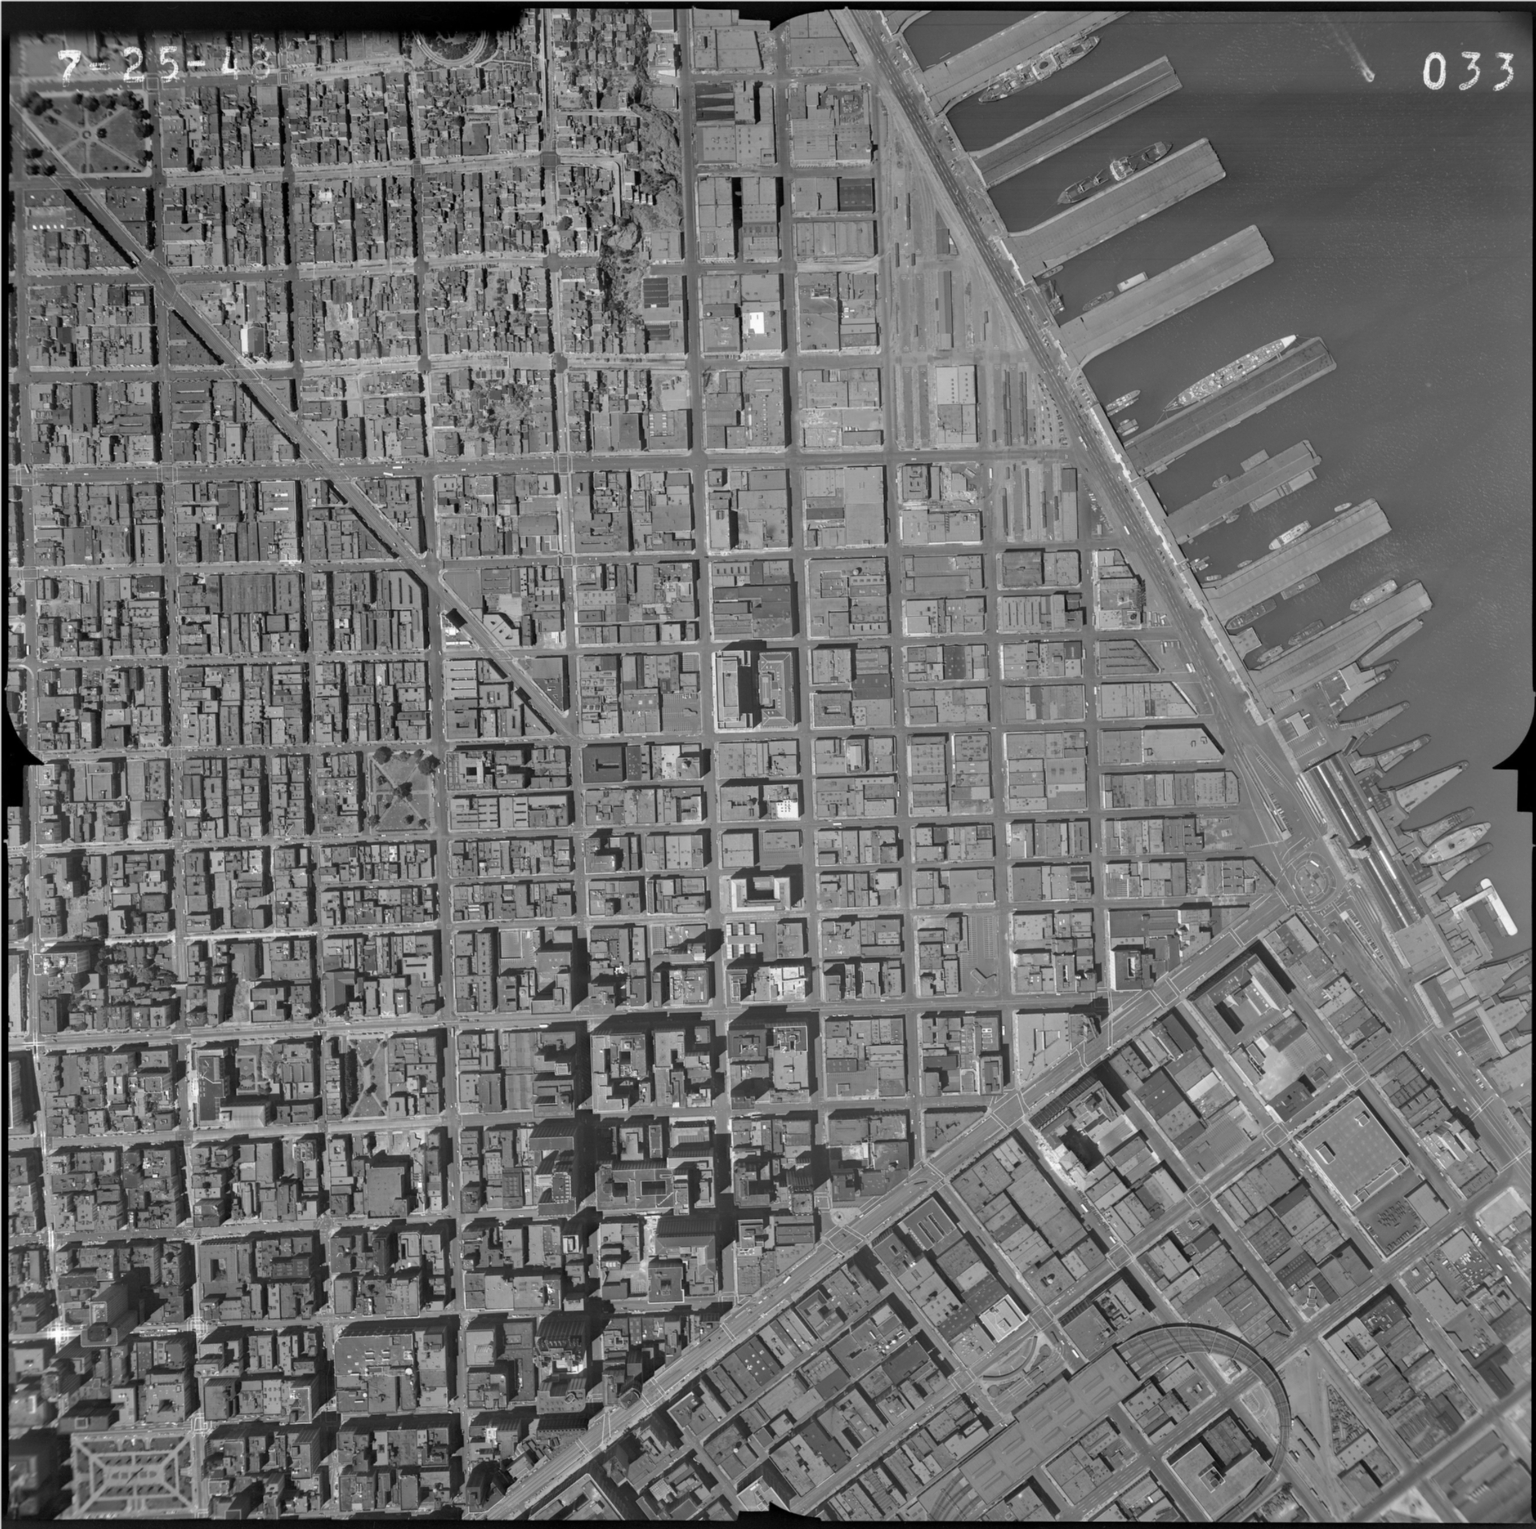 33. San Francisco Aerial Photo Survey.